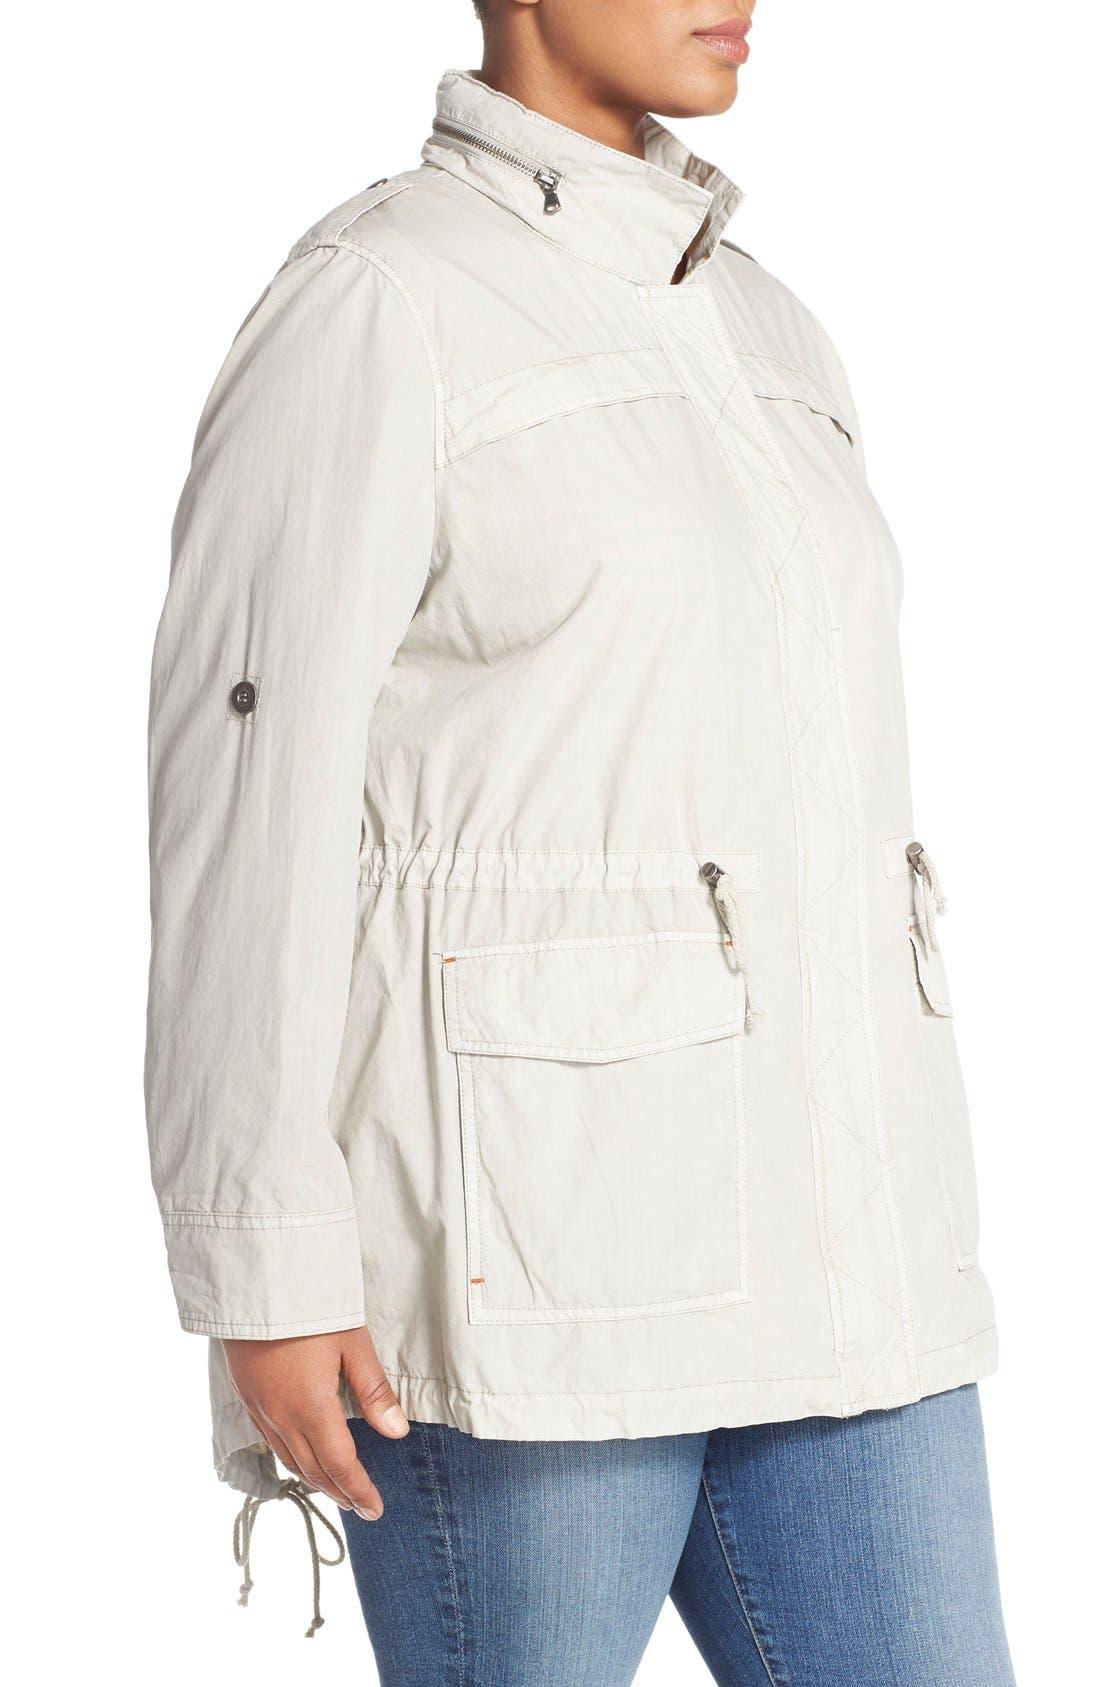 Parachute Hooded Cotton Utility Jacket,                             Alternate thumbnail 5, color,